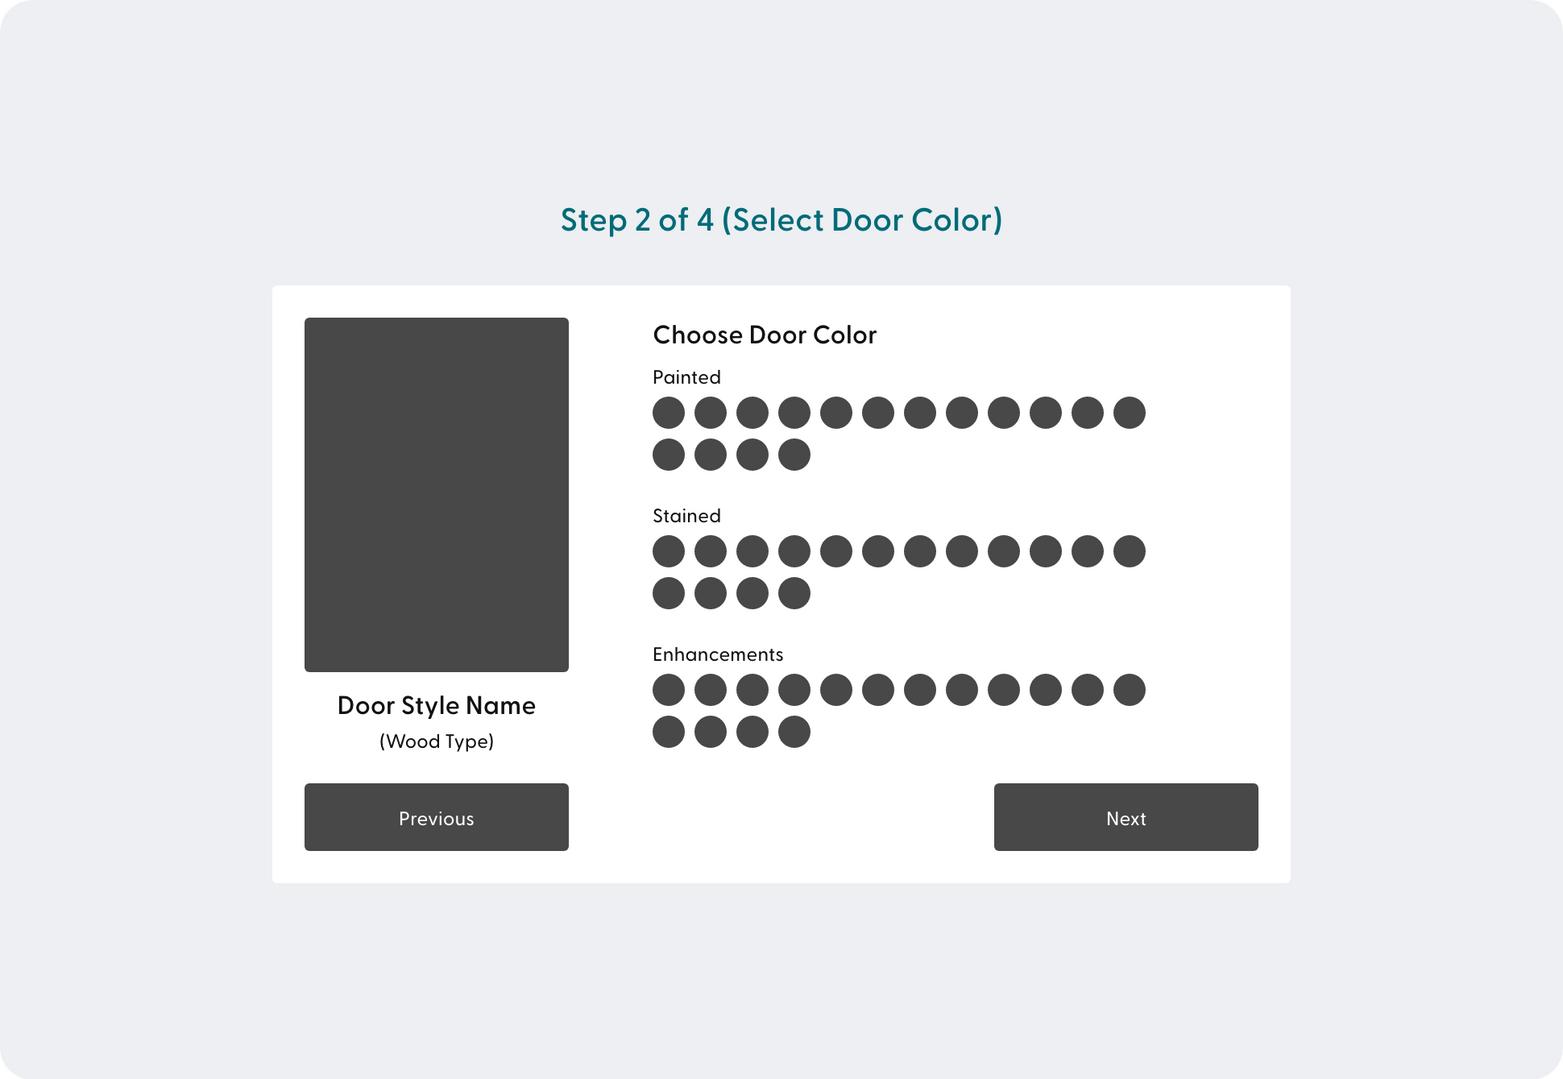 Step 2 of 4 (Select Door Color)@2x.png